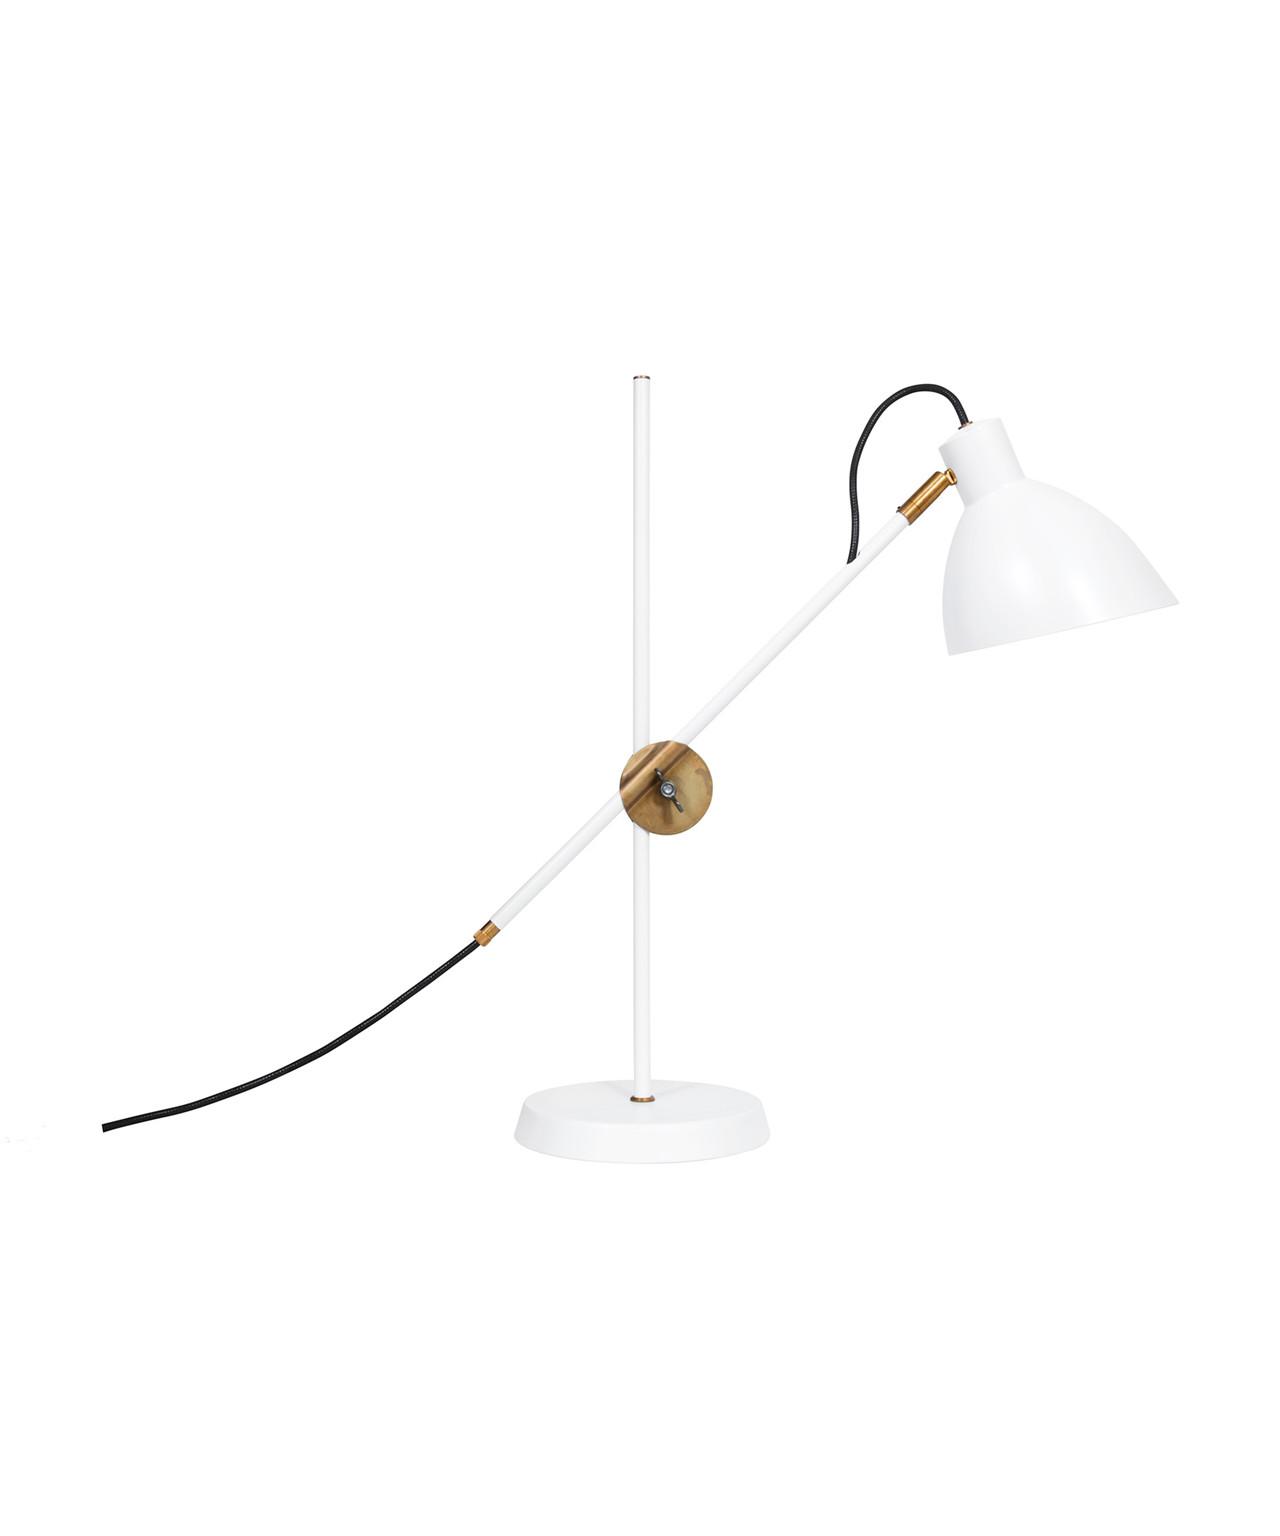 Kh#1 hvid/rå messing bordlampe